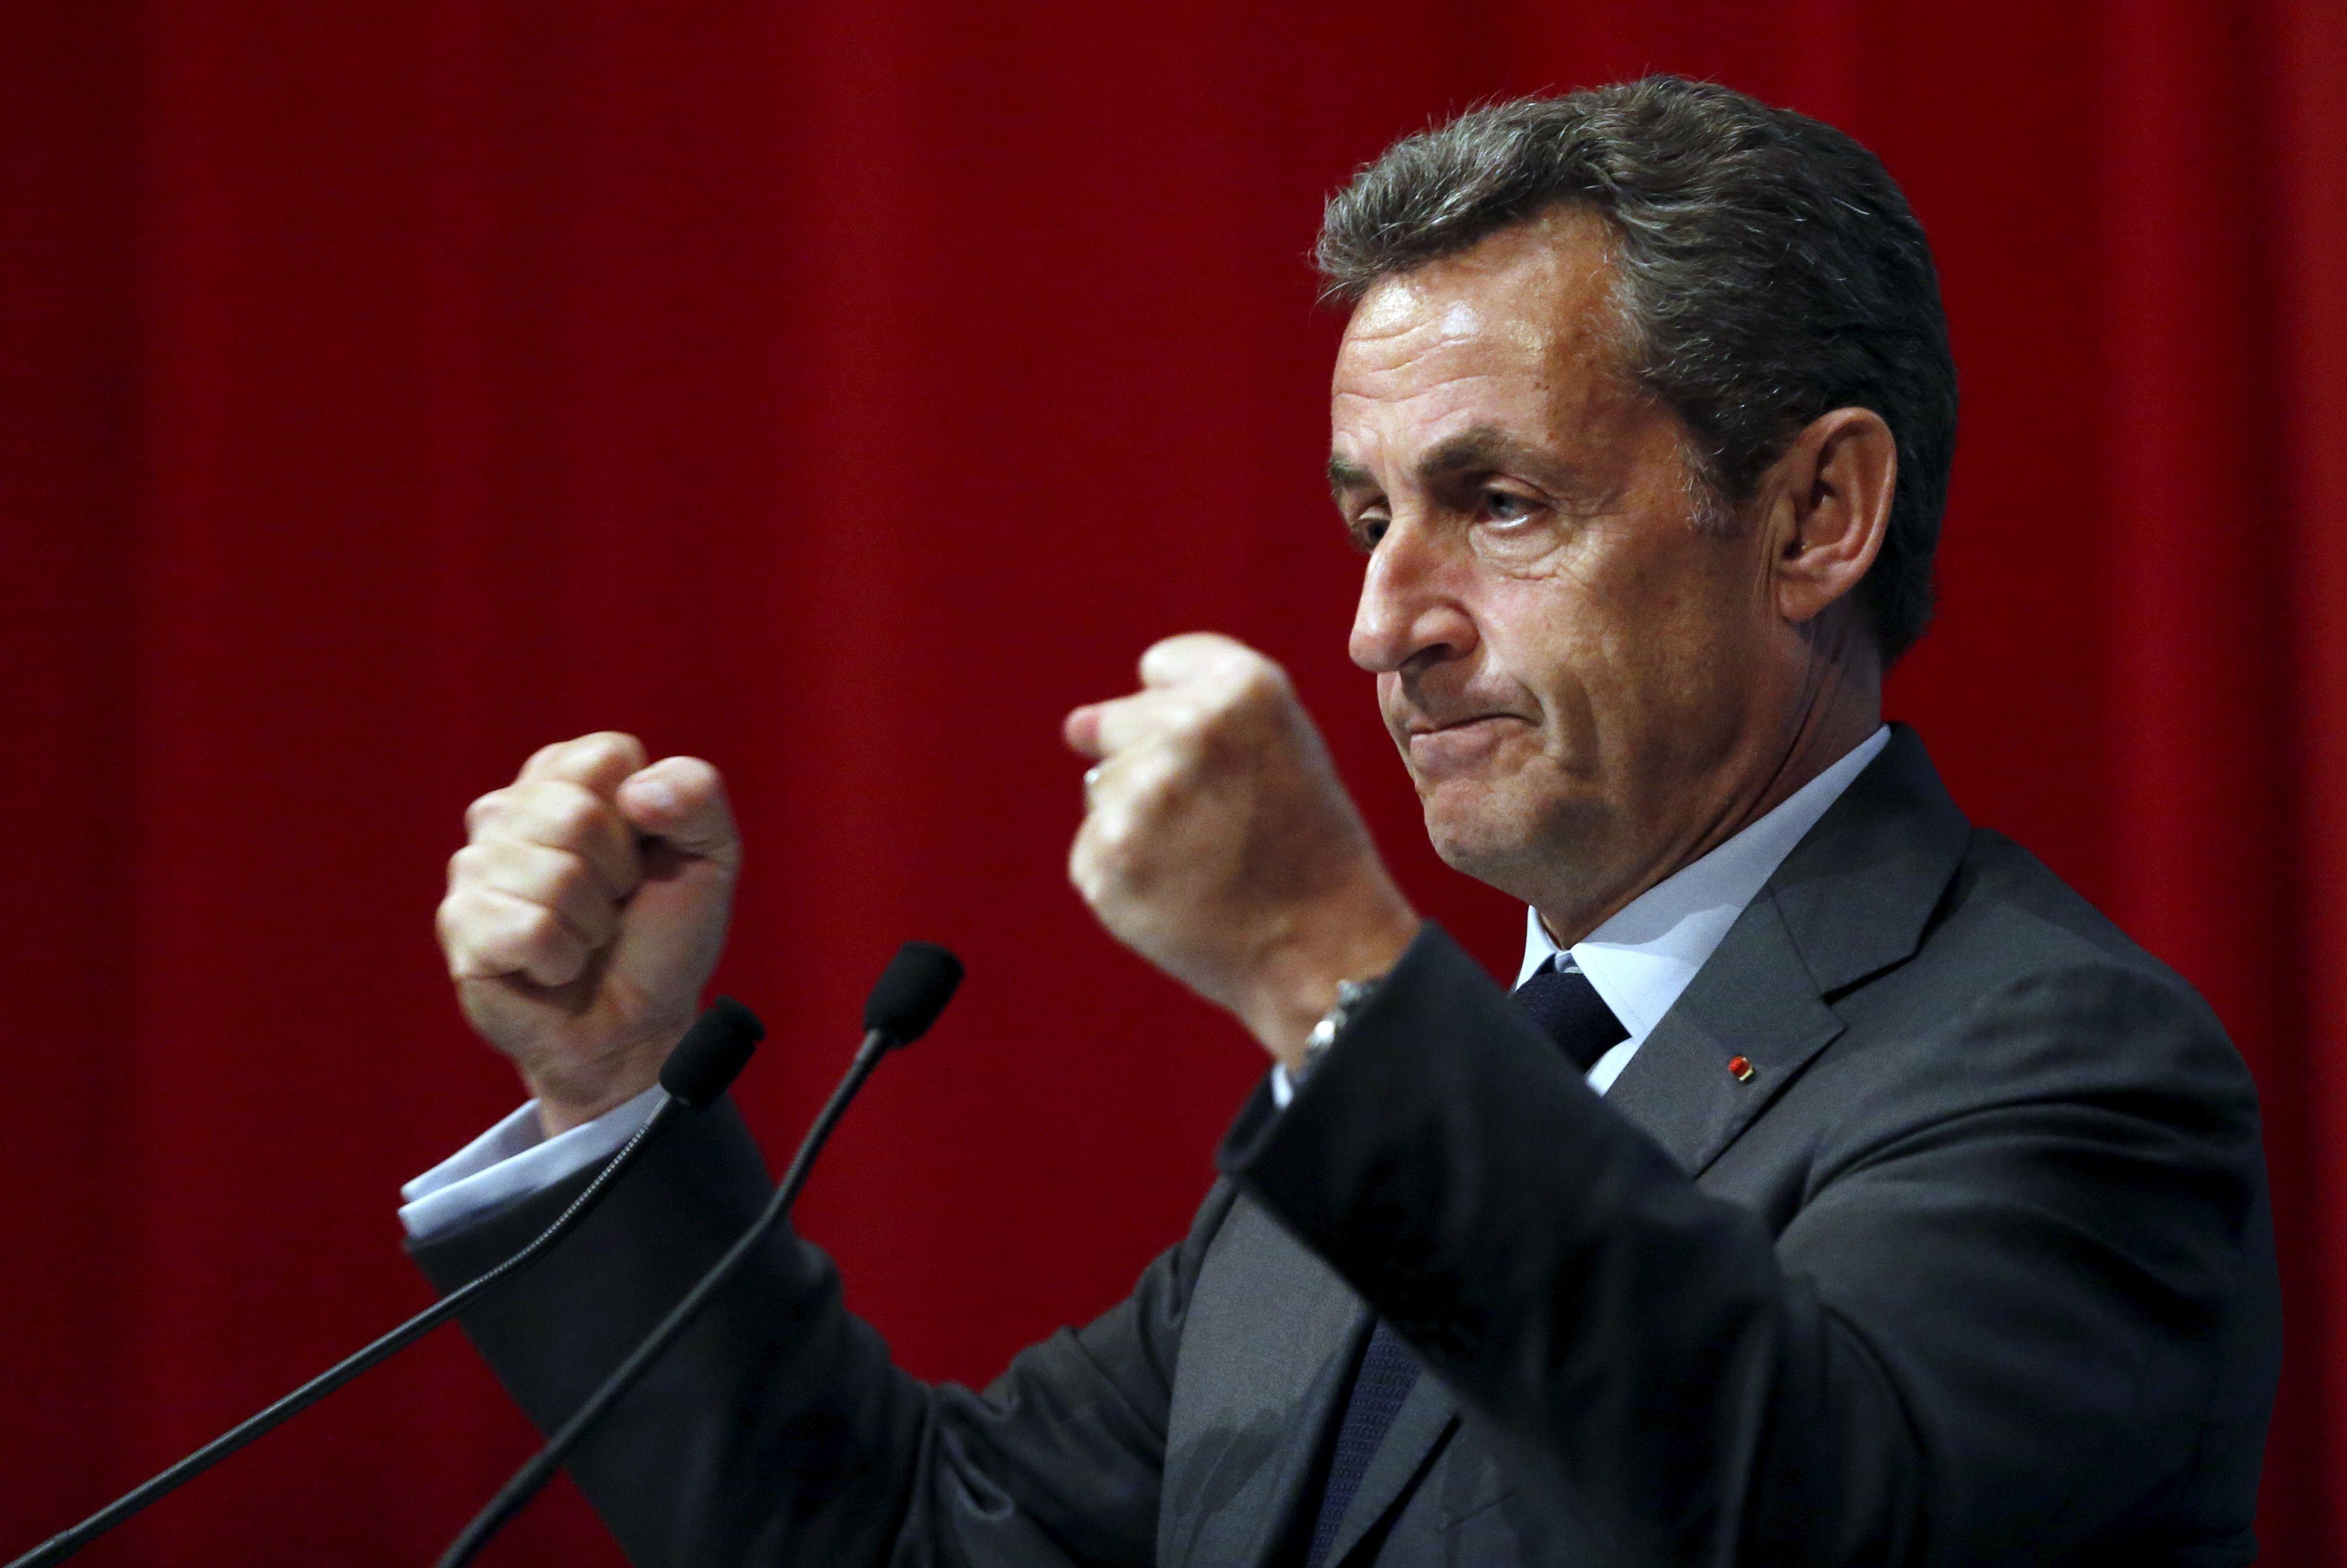 C'est le neuvième livre de Nicolas Sarkozy